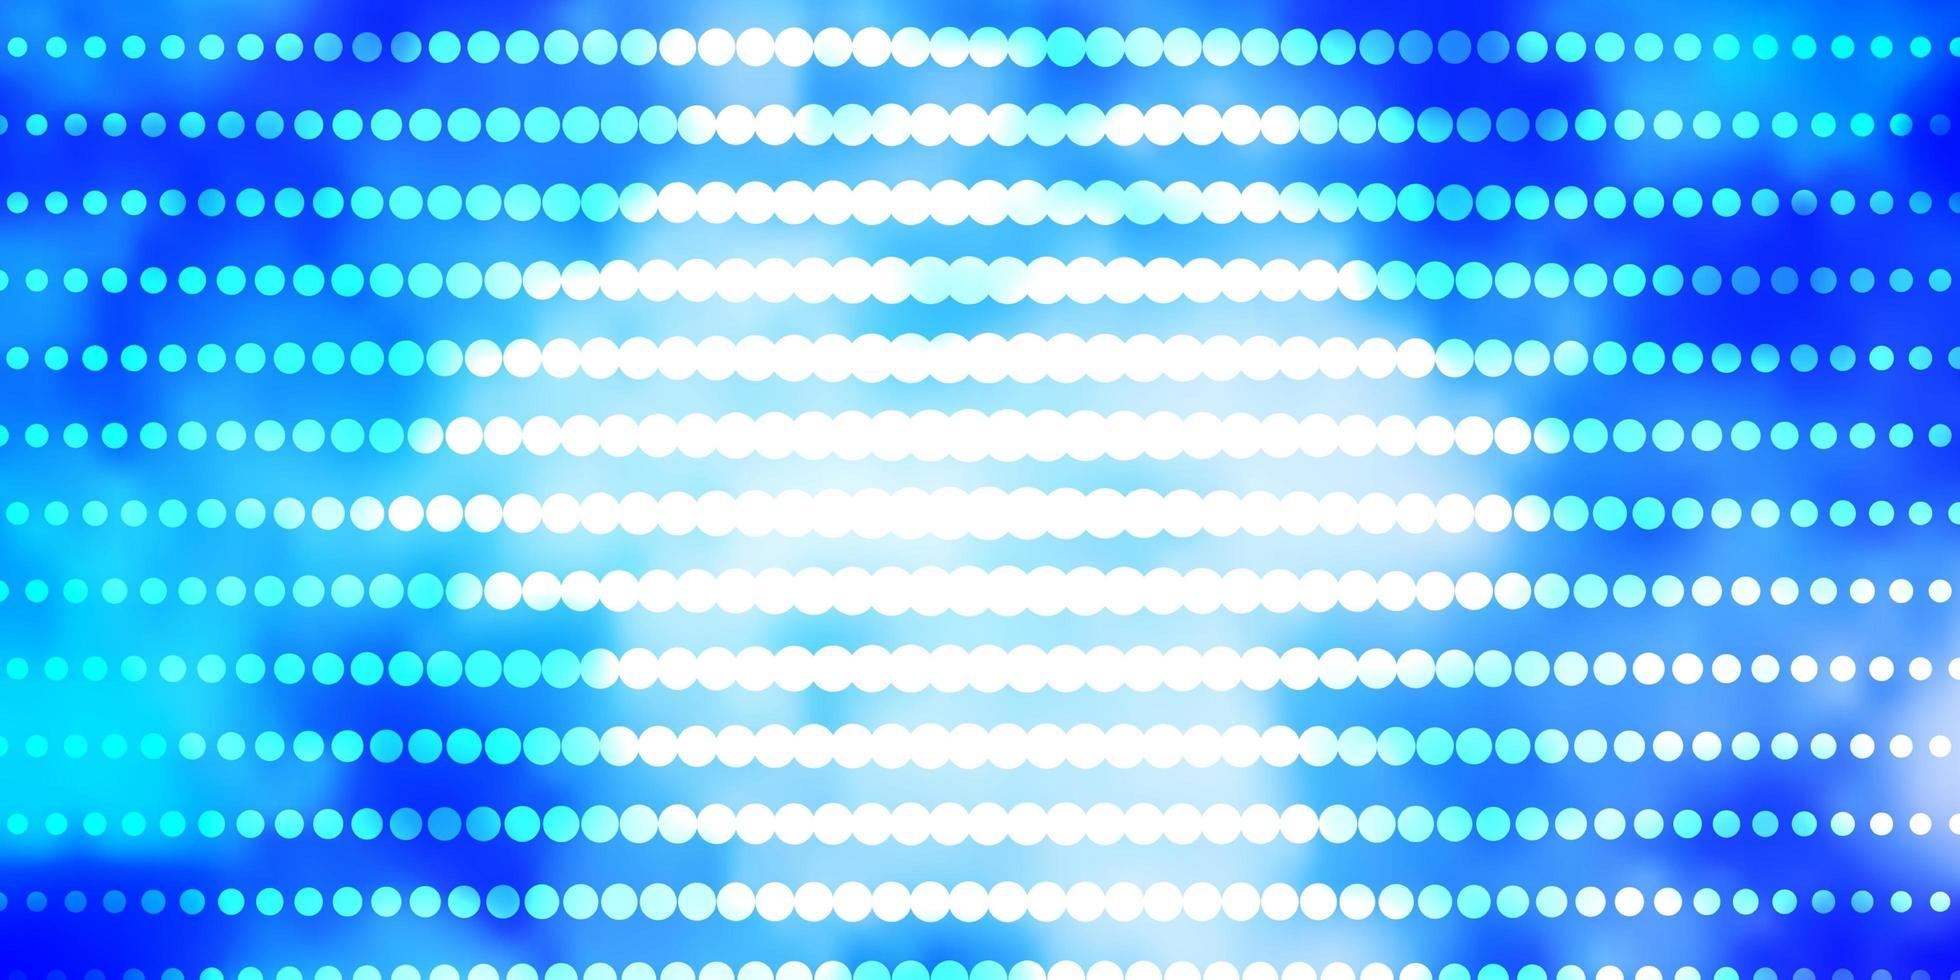 textura de vetor rosa claro, azul com círculos.